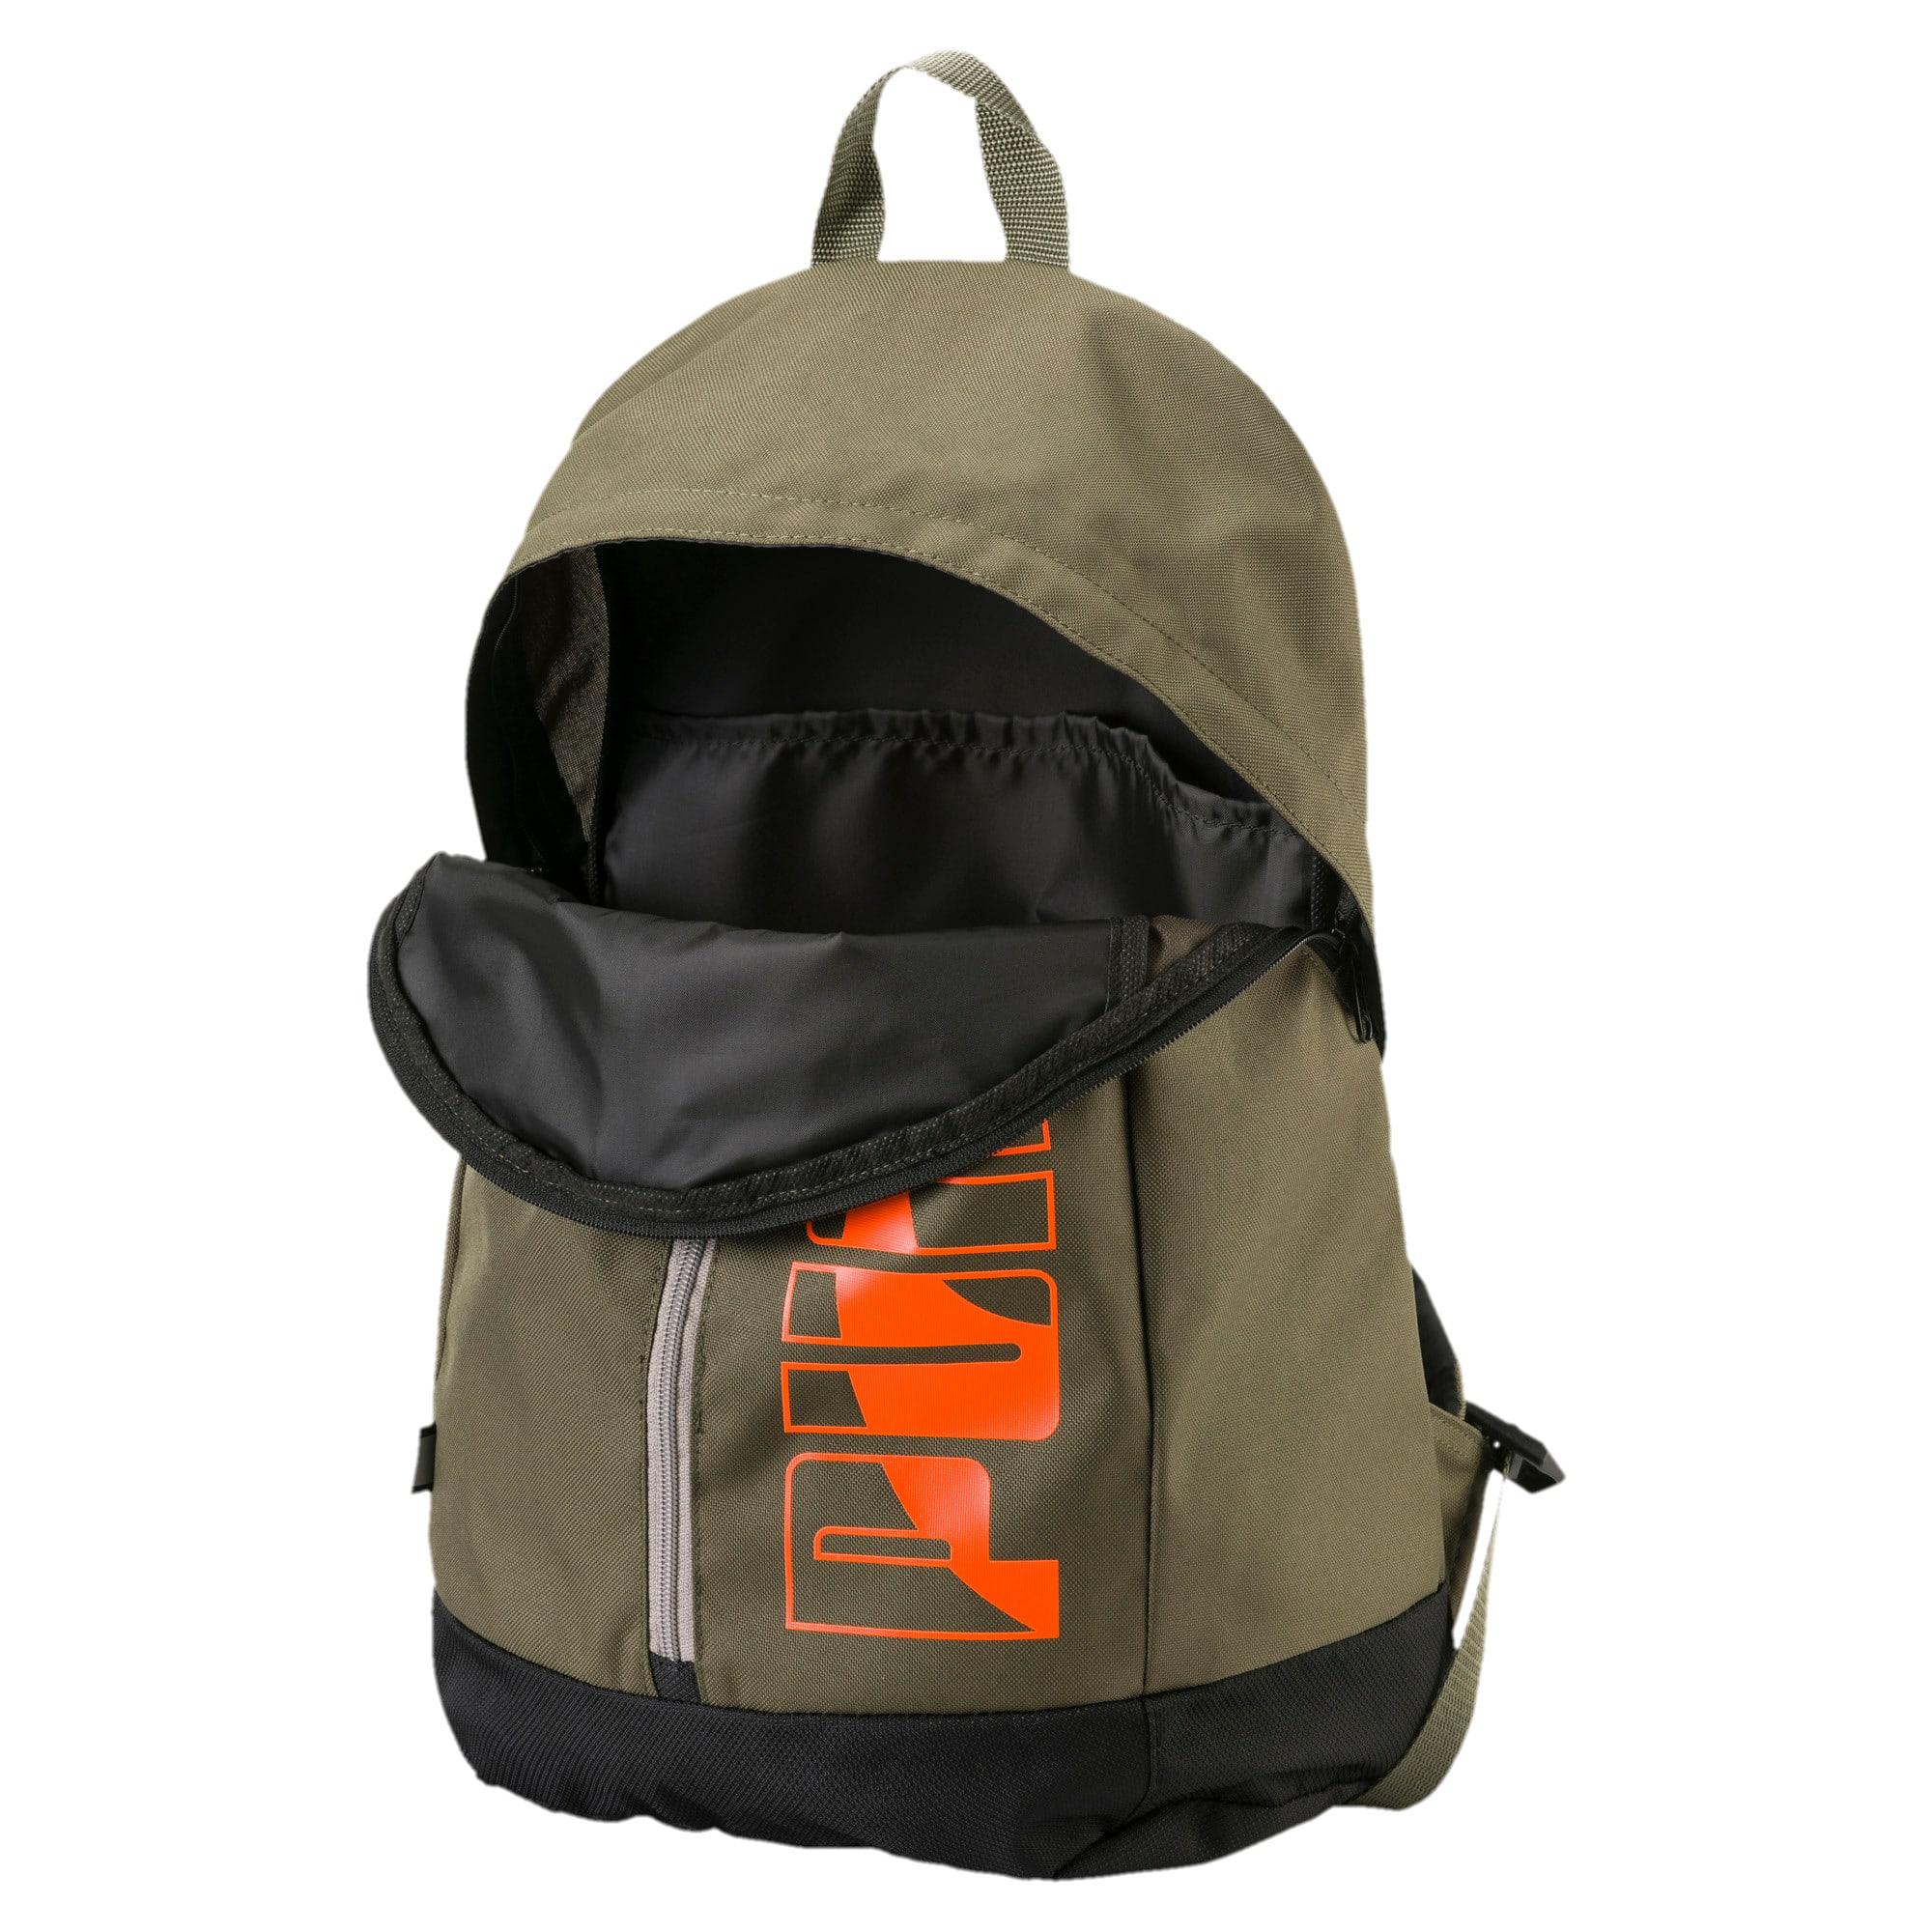 Thumbnail 3 of Pioneer Backpack II, Olive Night, medium-IND